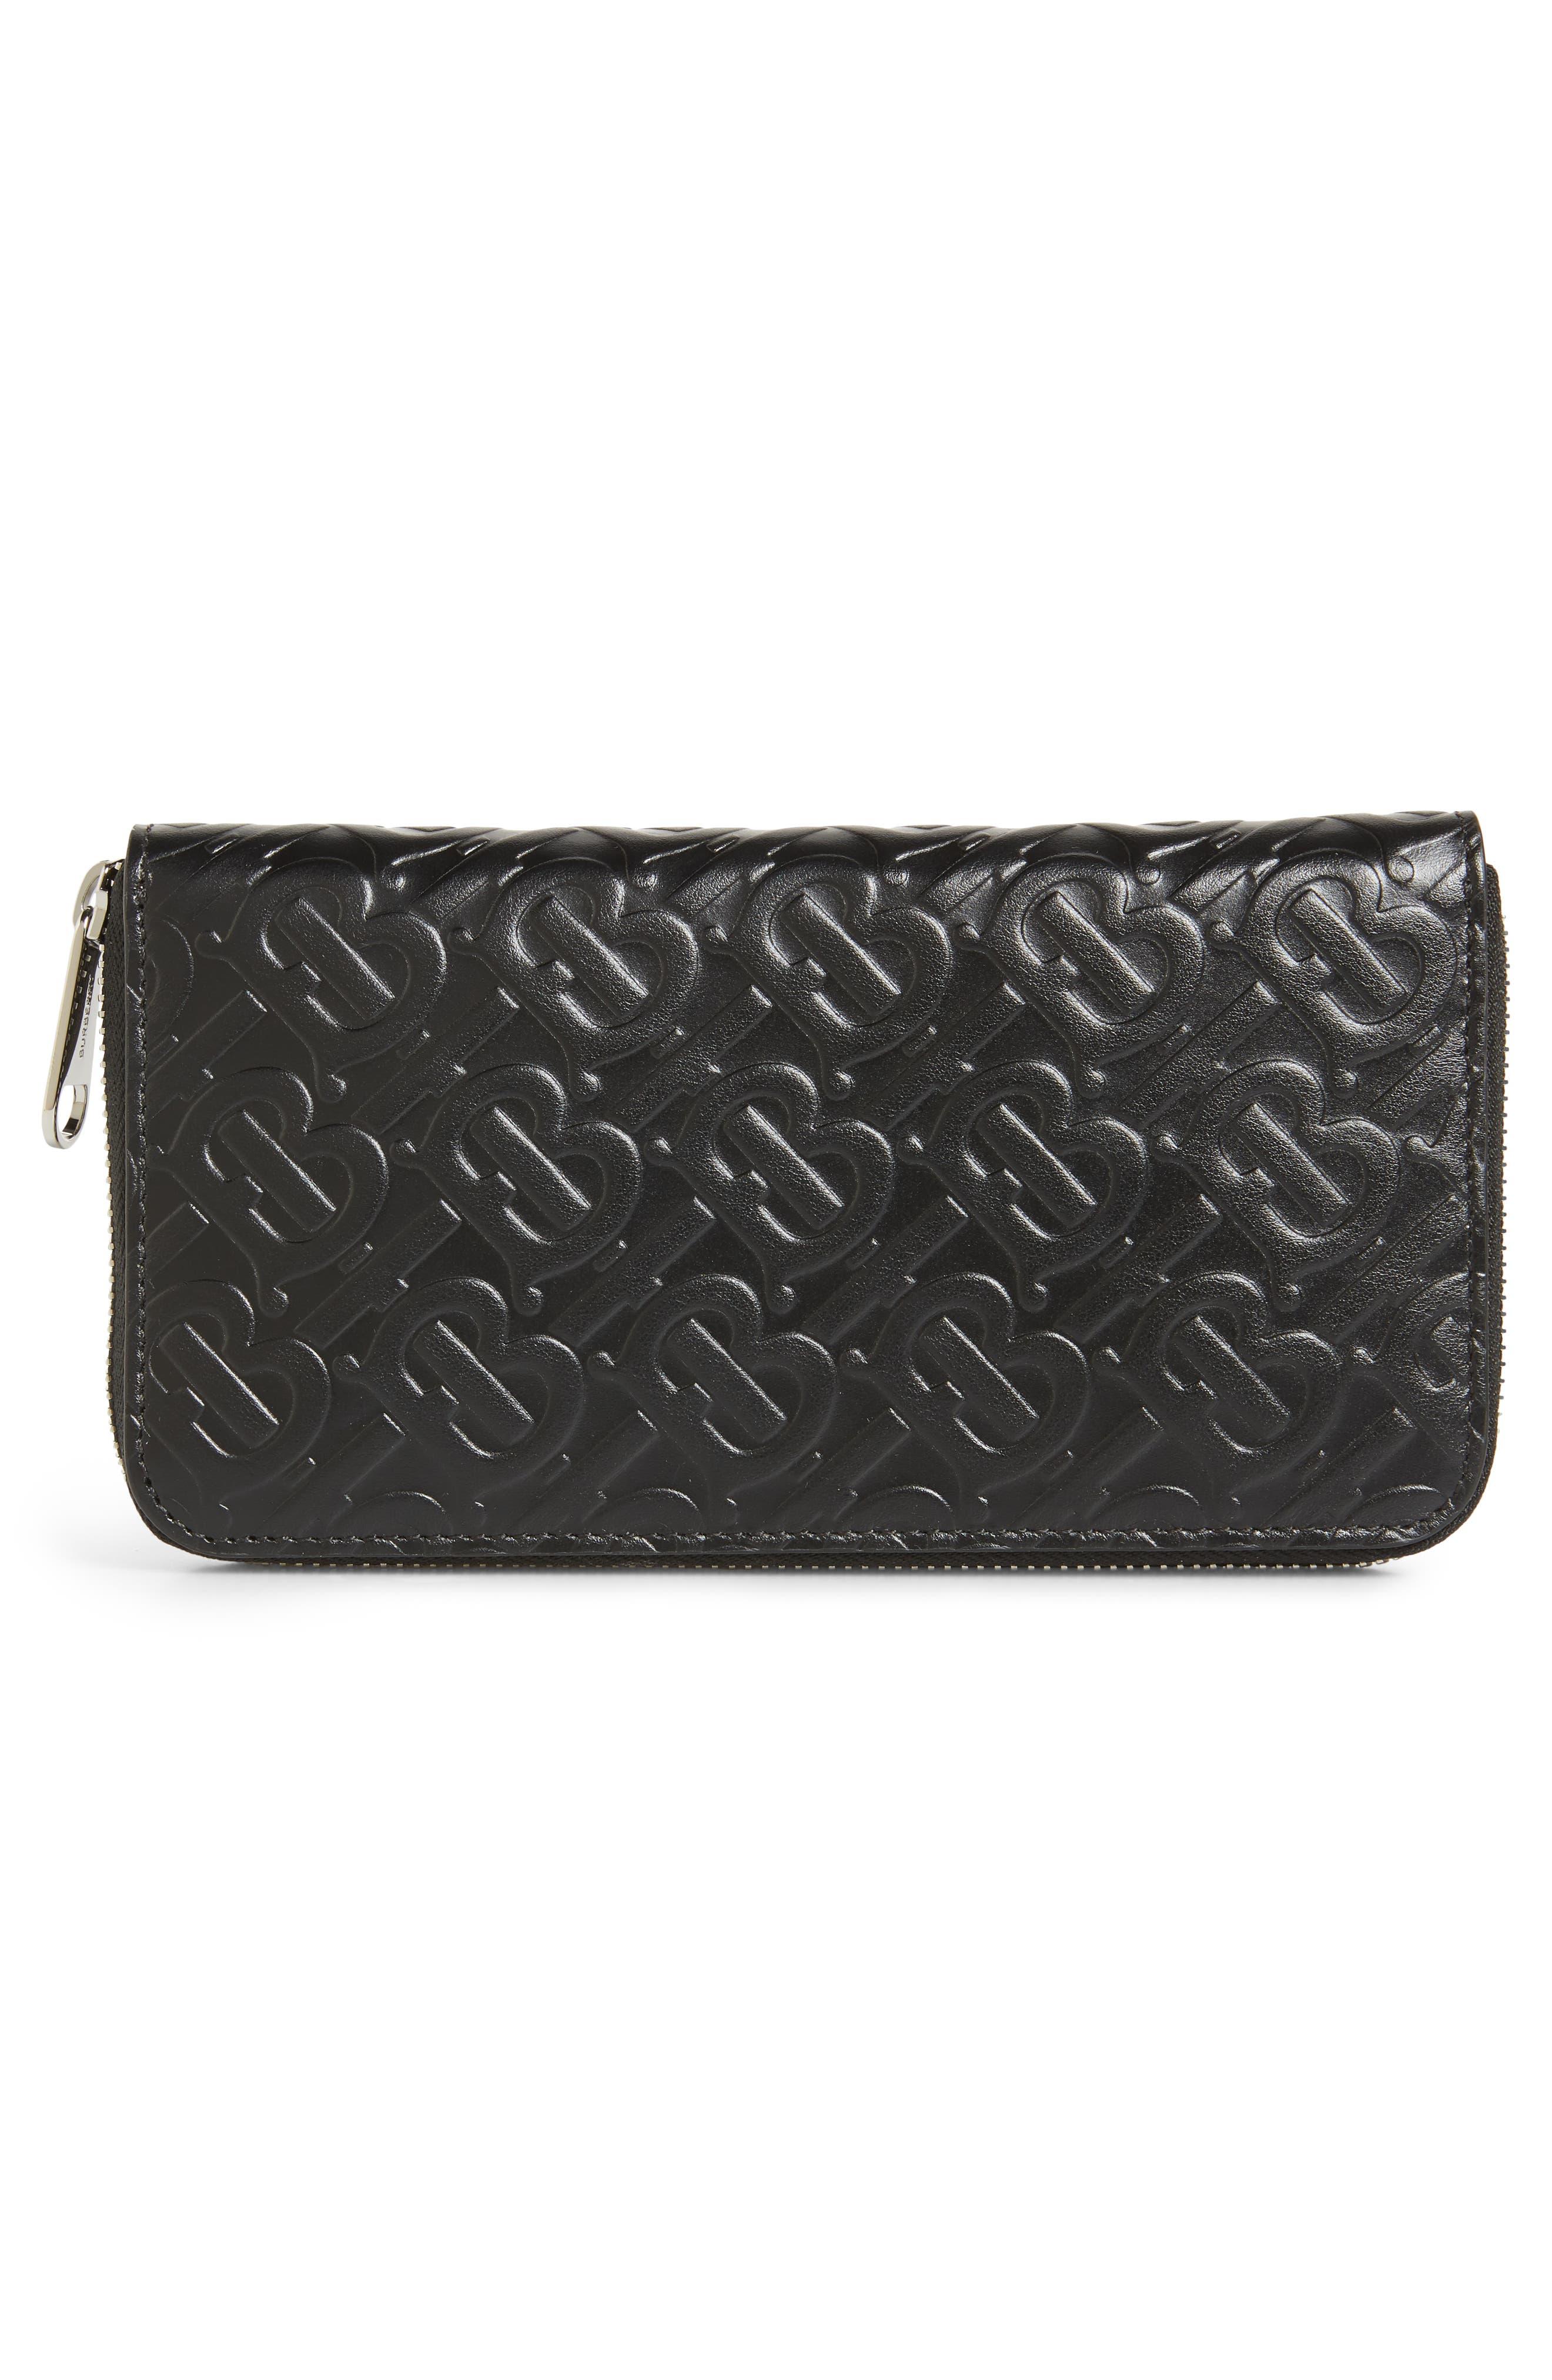 BURBERRY, Large Monogram Leather Wallet, Alternate thumbnail 2, color, BLACK